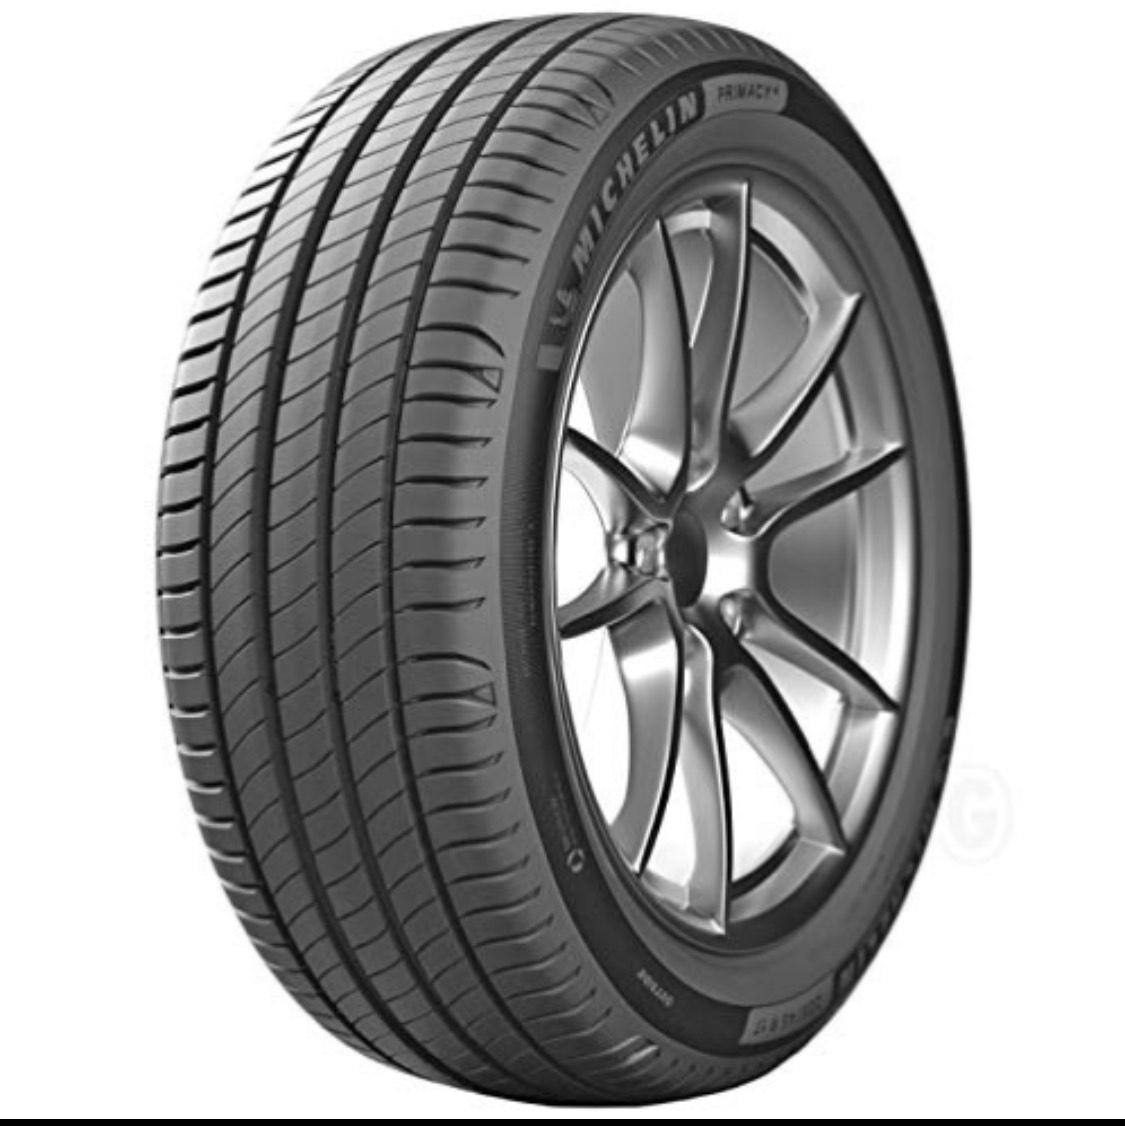 Michelin Primacy 4 FSL - 205/55R16 91W, Neumático de Verano